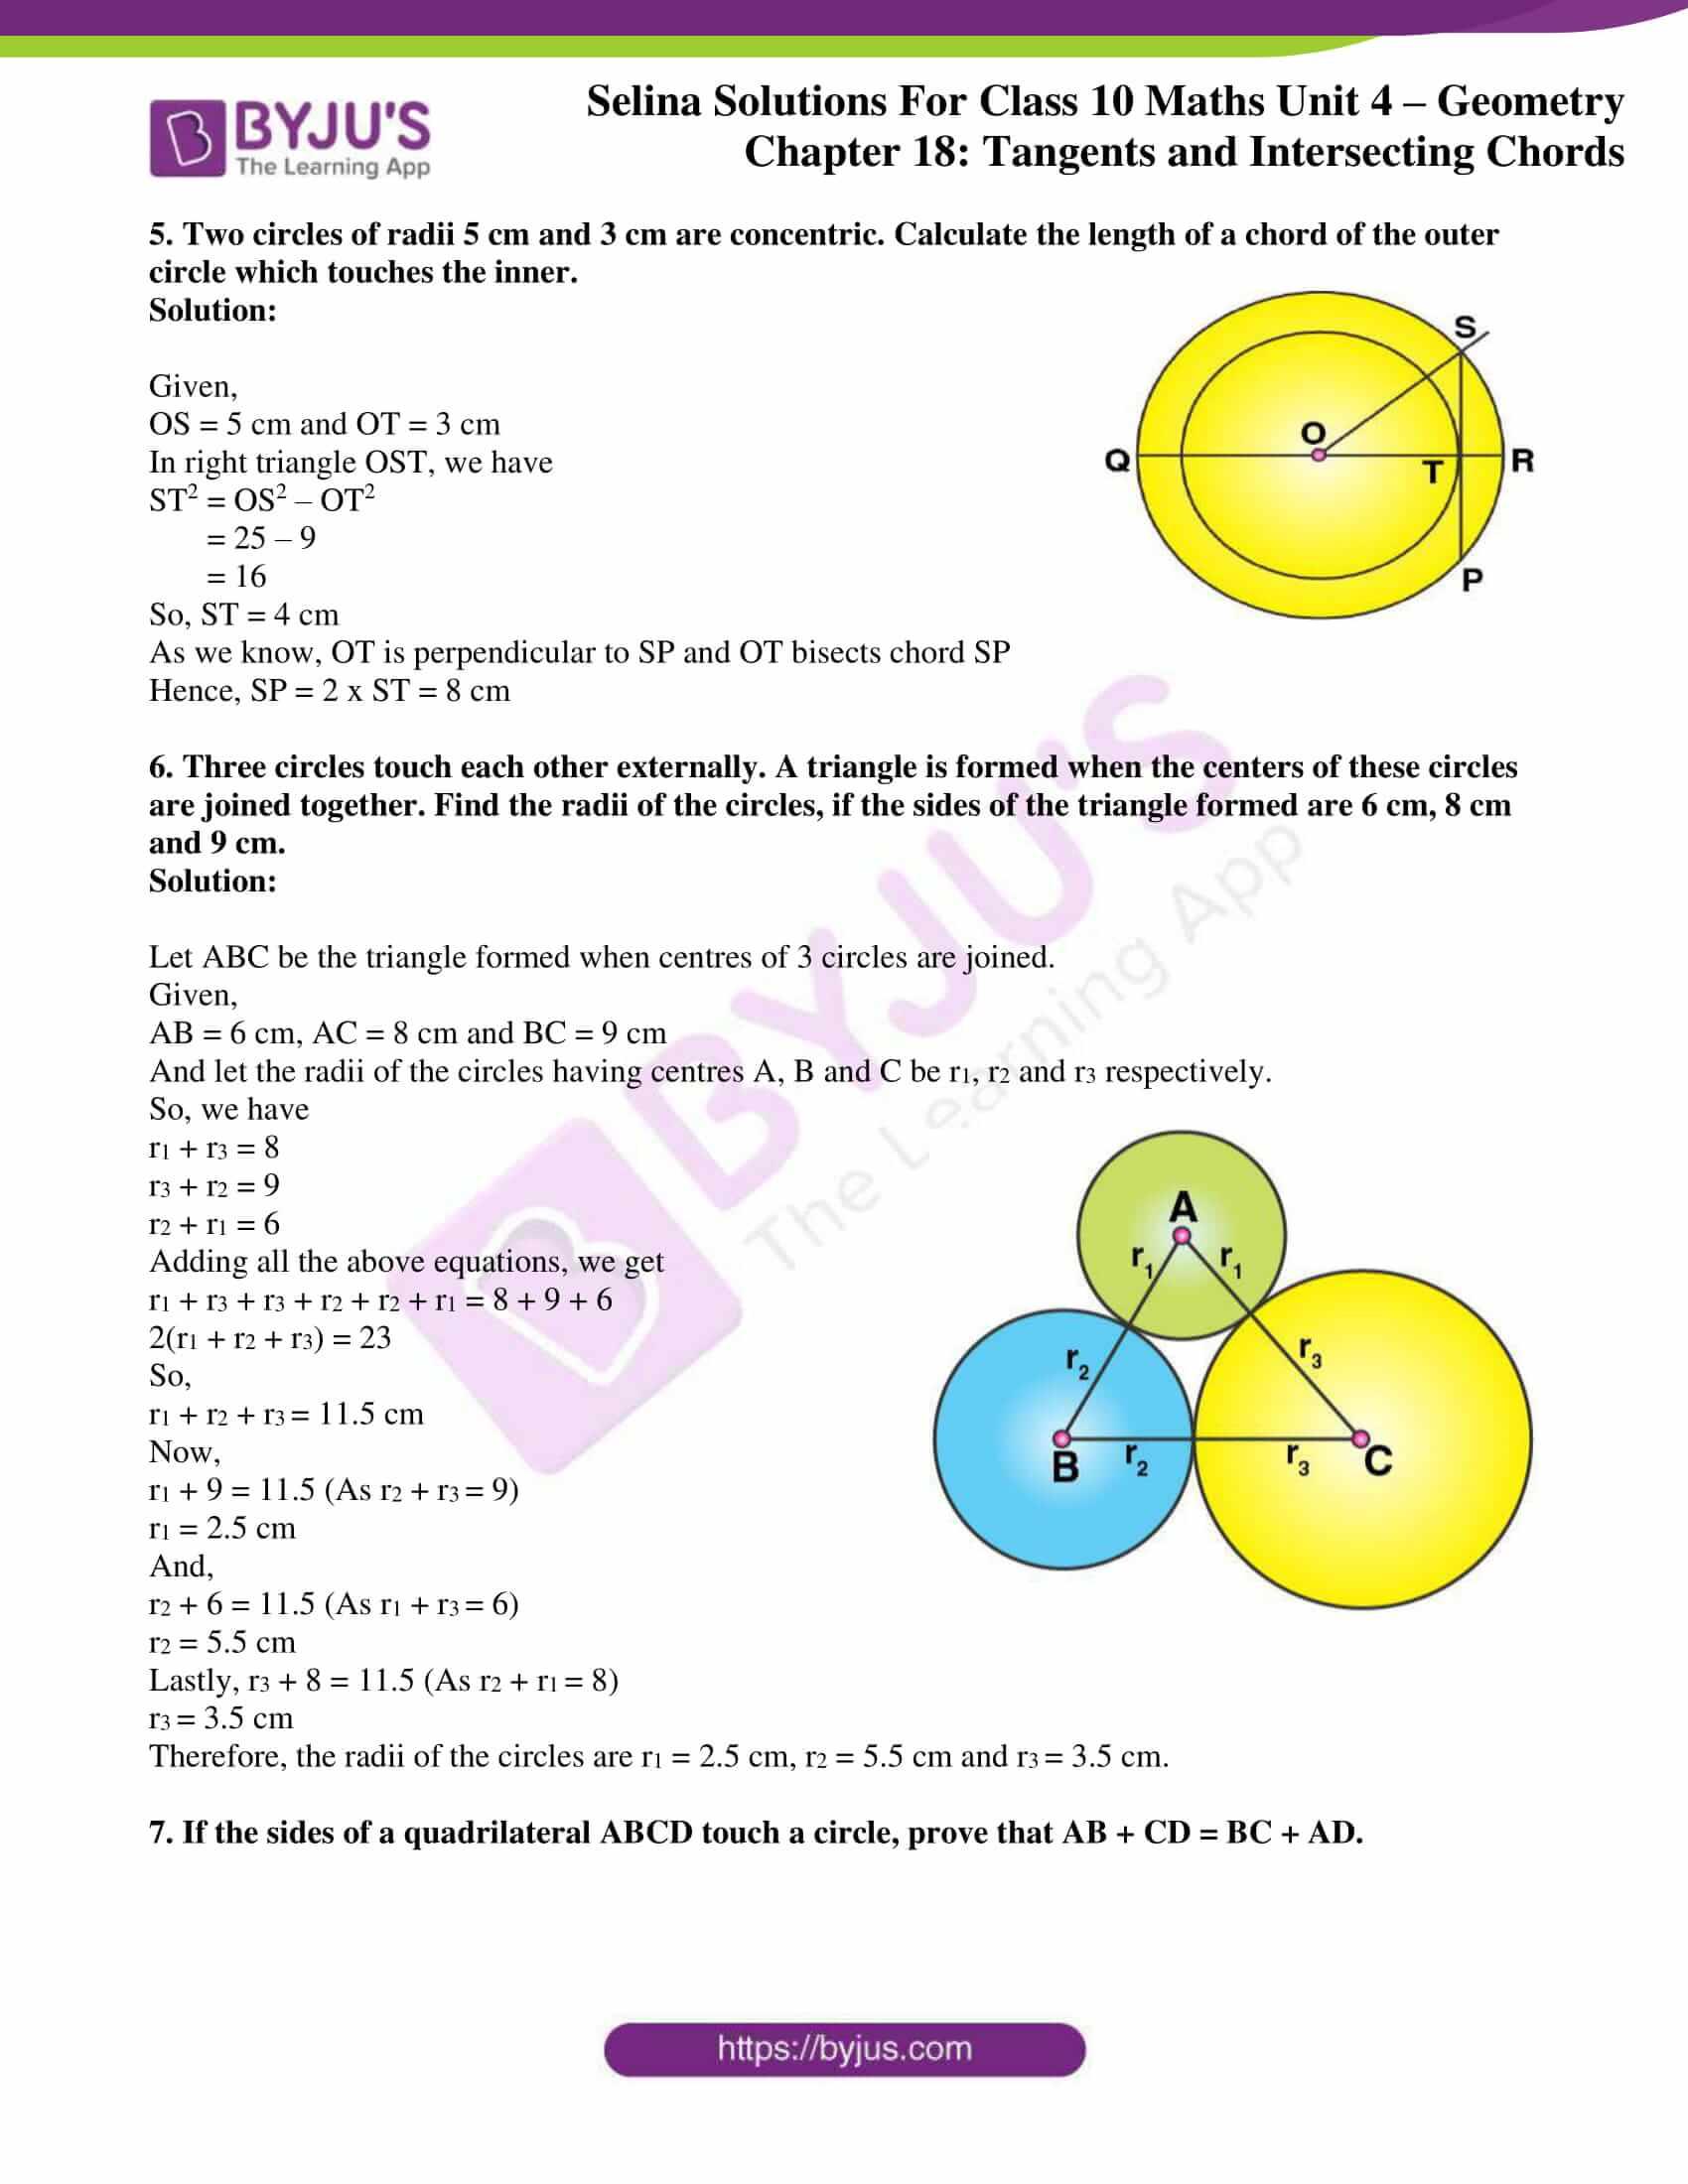 selina-sol-maths-class-10-ch-18-ex-a-3